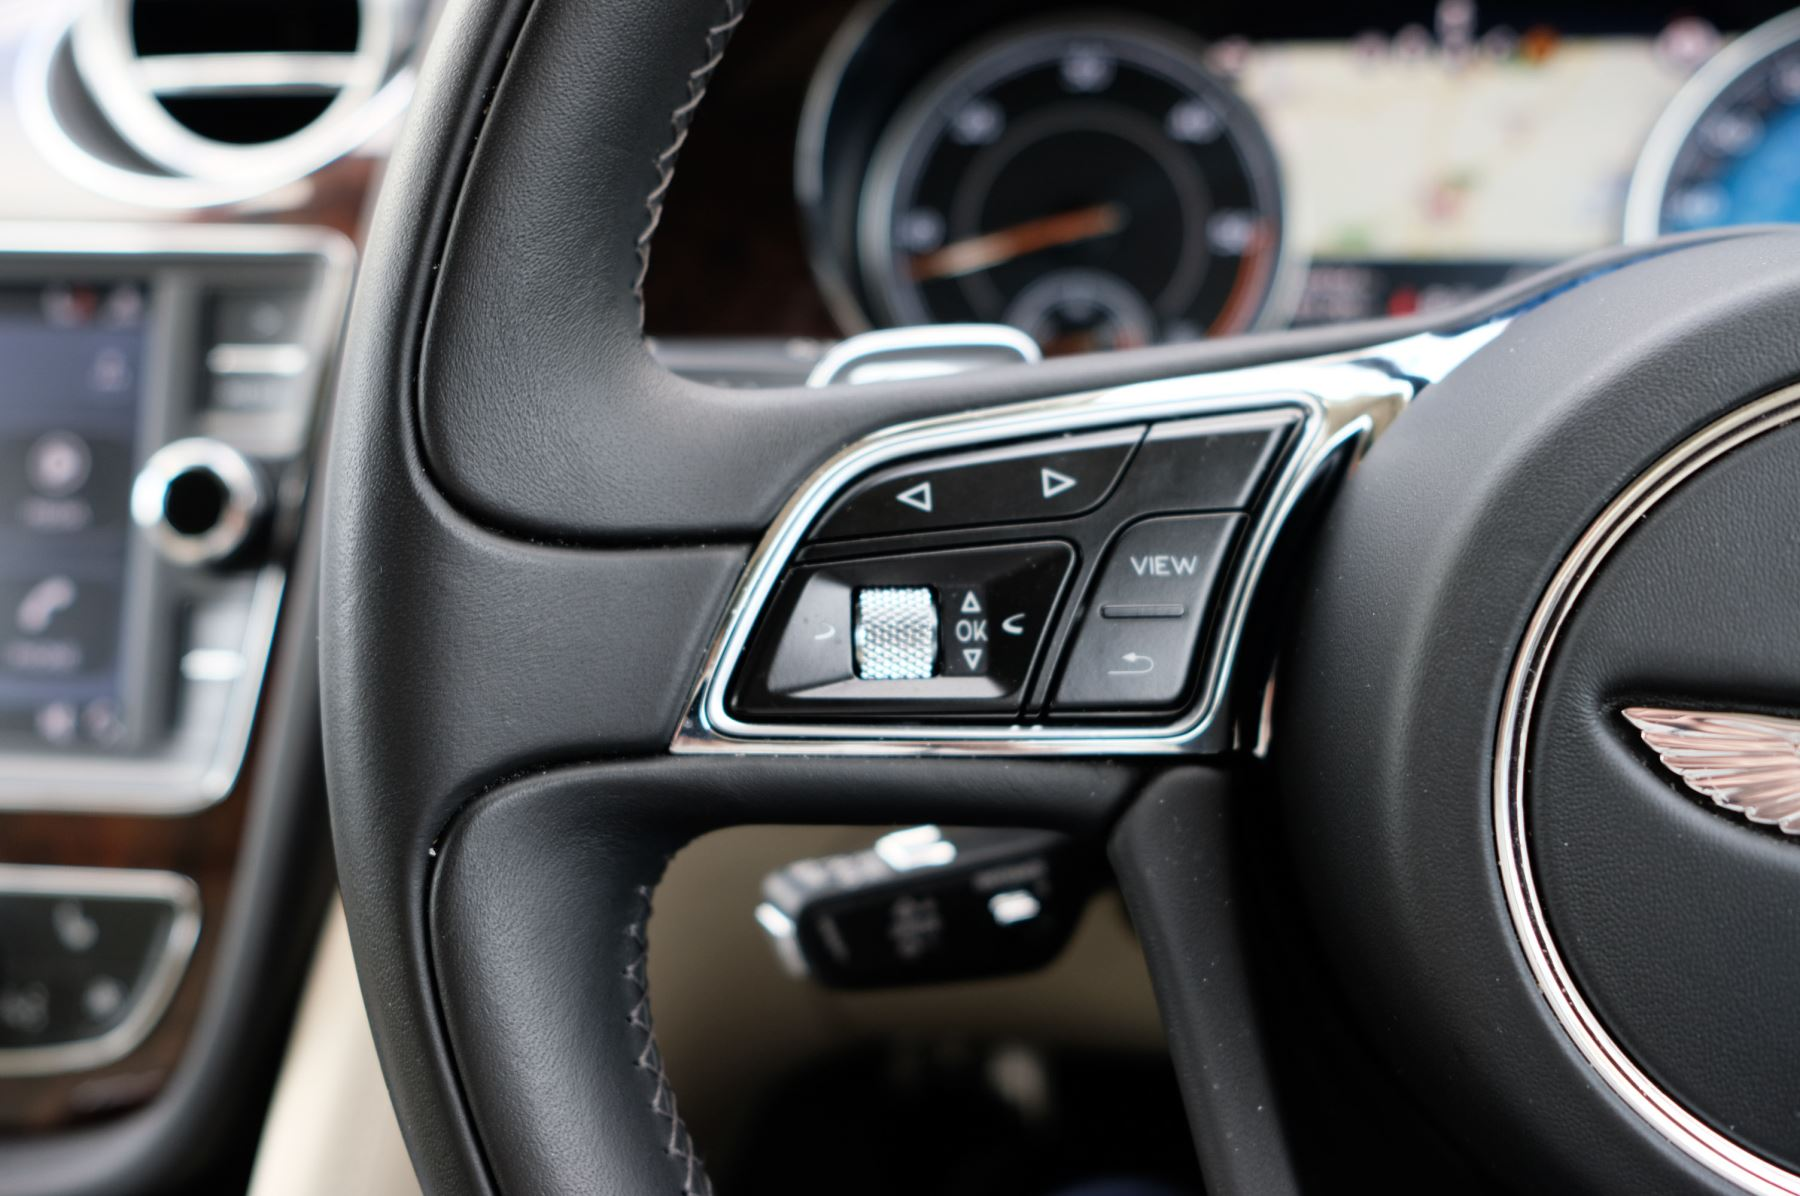 Bentley Bentayga 4.0 V8 5dr - Mulliner Driving Specification - City & Tour Specification image 25